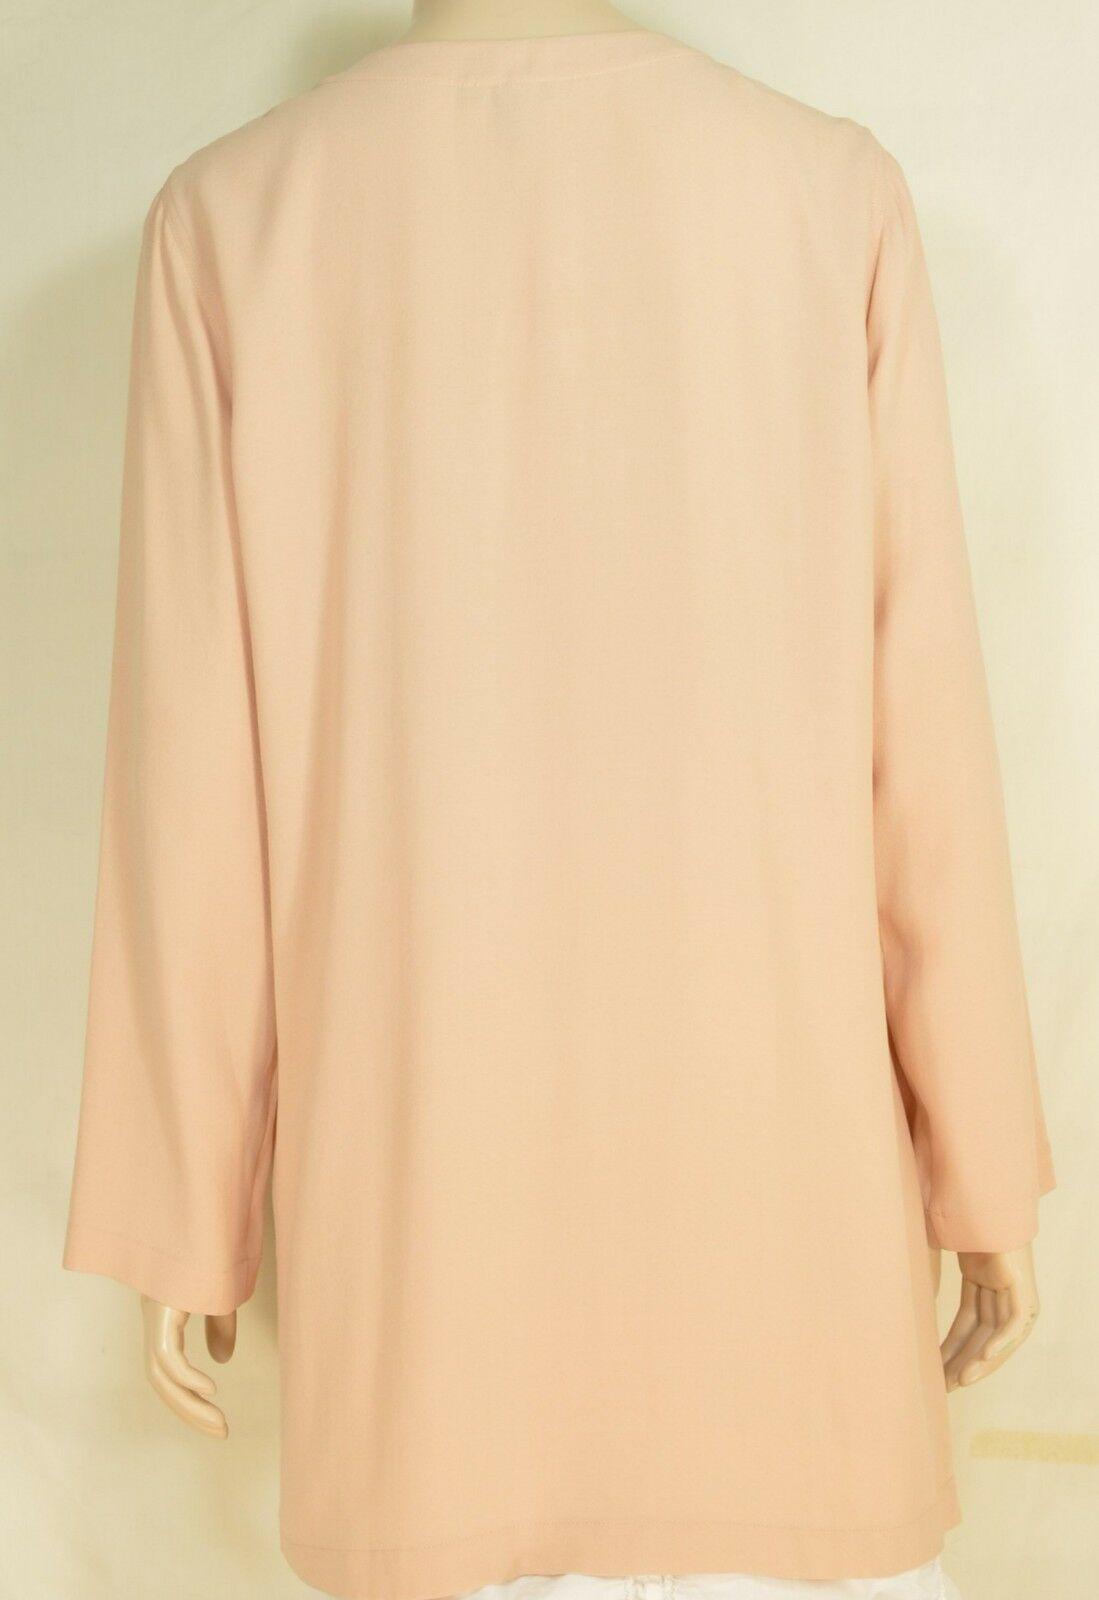 Eileen Fisher top tunic SZ M beige tan 100% silk long sleeve